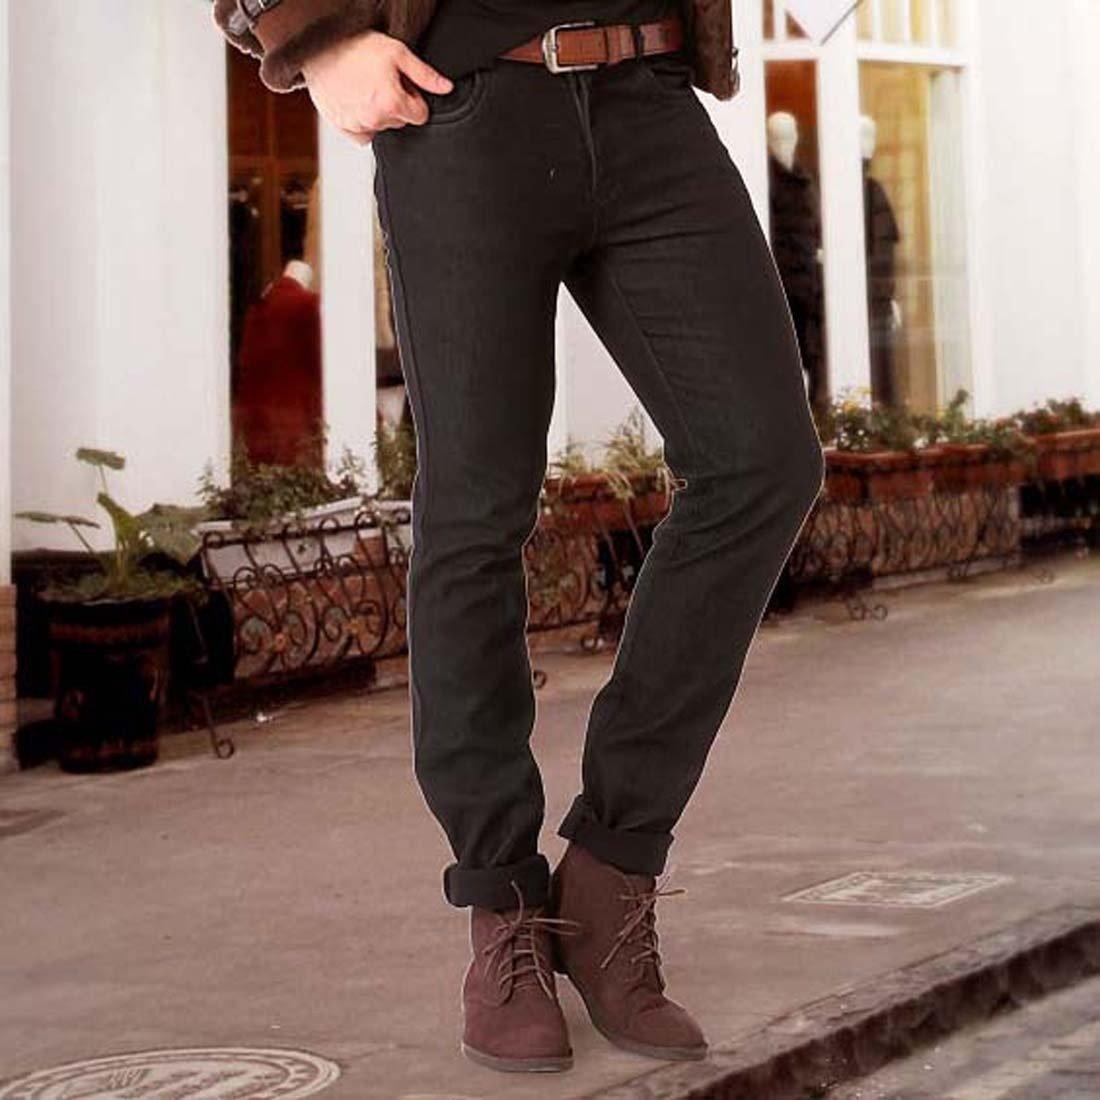 WENJHEN High Top Men Martin Boots Casual Shoes B06XZY2K53 B06XZY2K53 B06XZY2K53 Motorcycle & Combat f75782